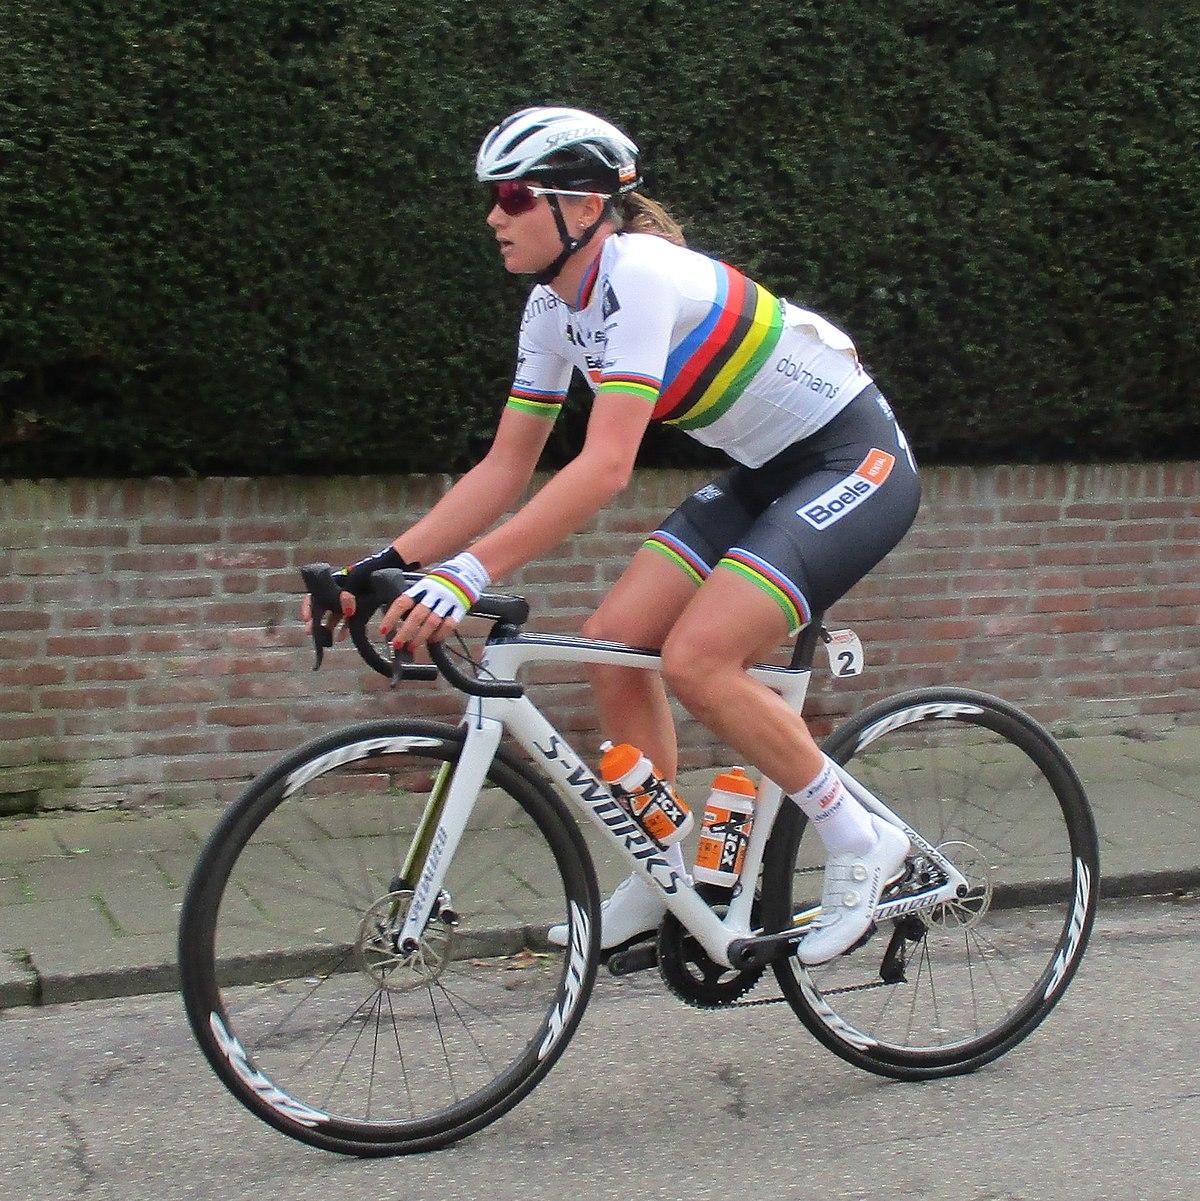 amstel gold race femenina 2018